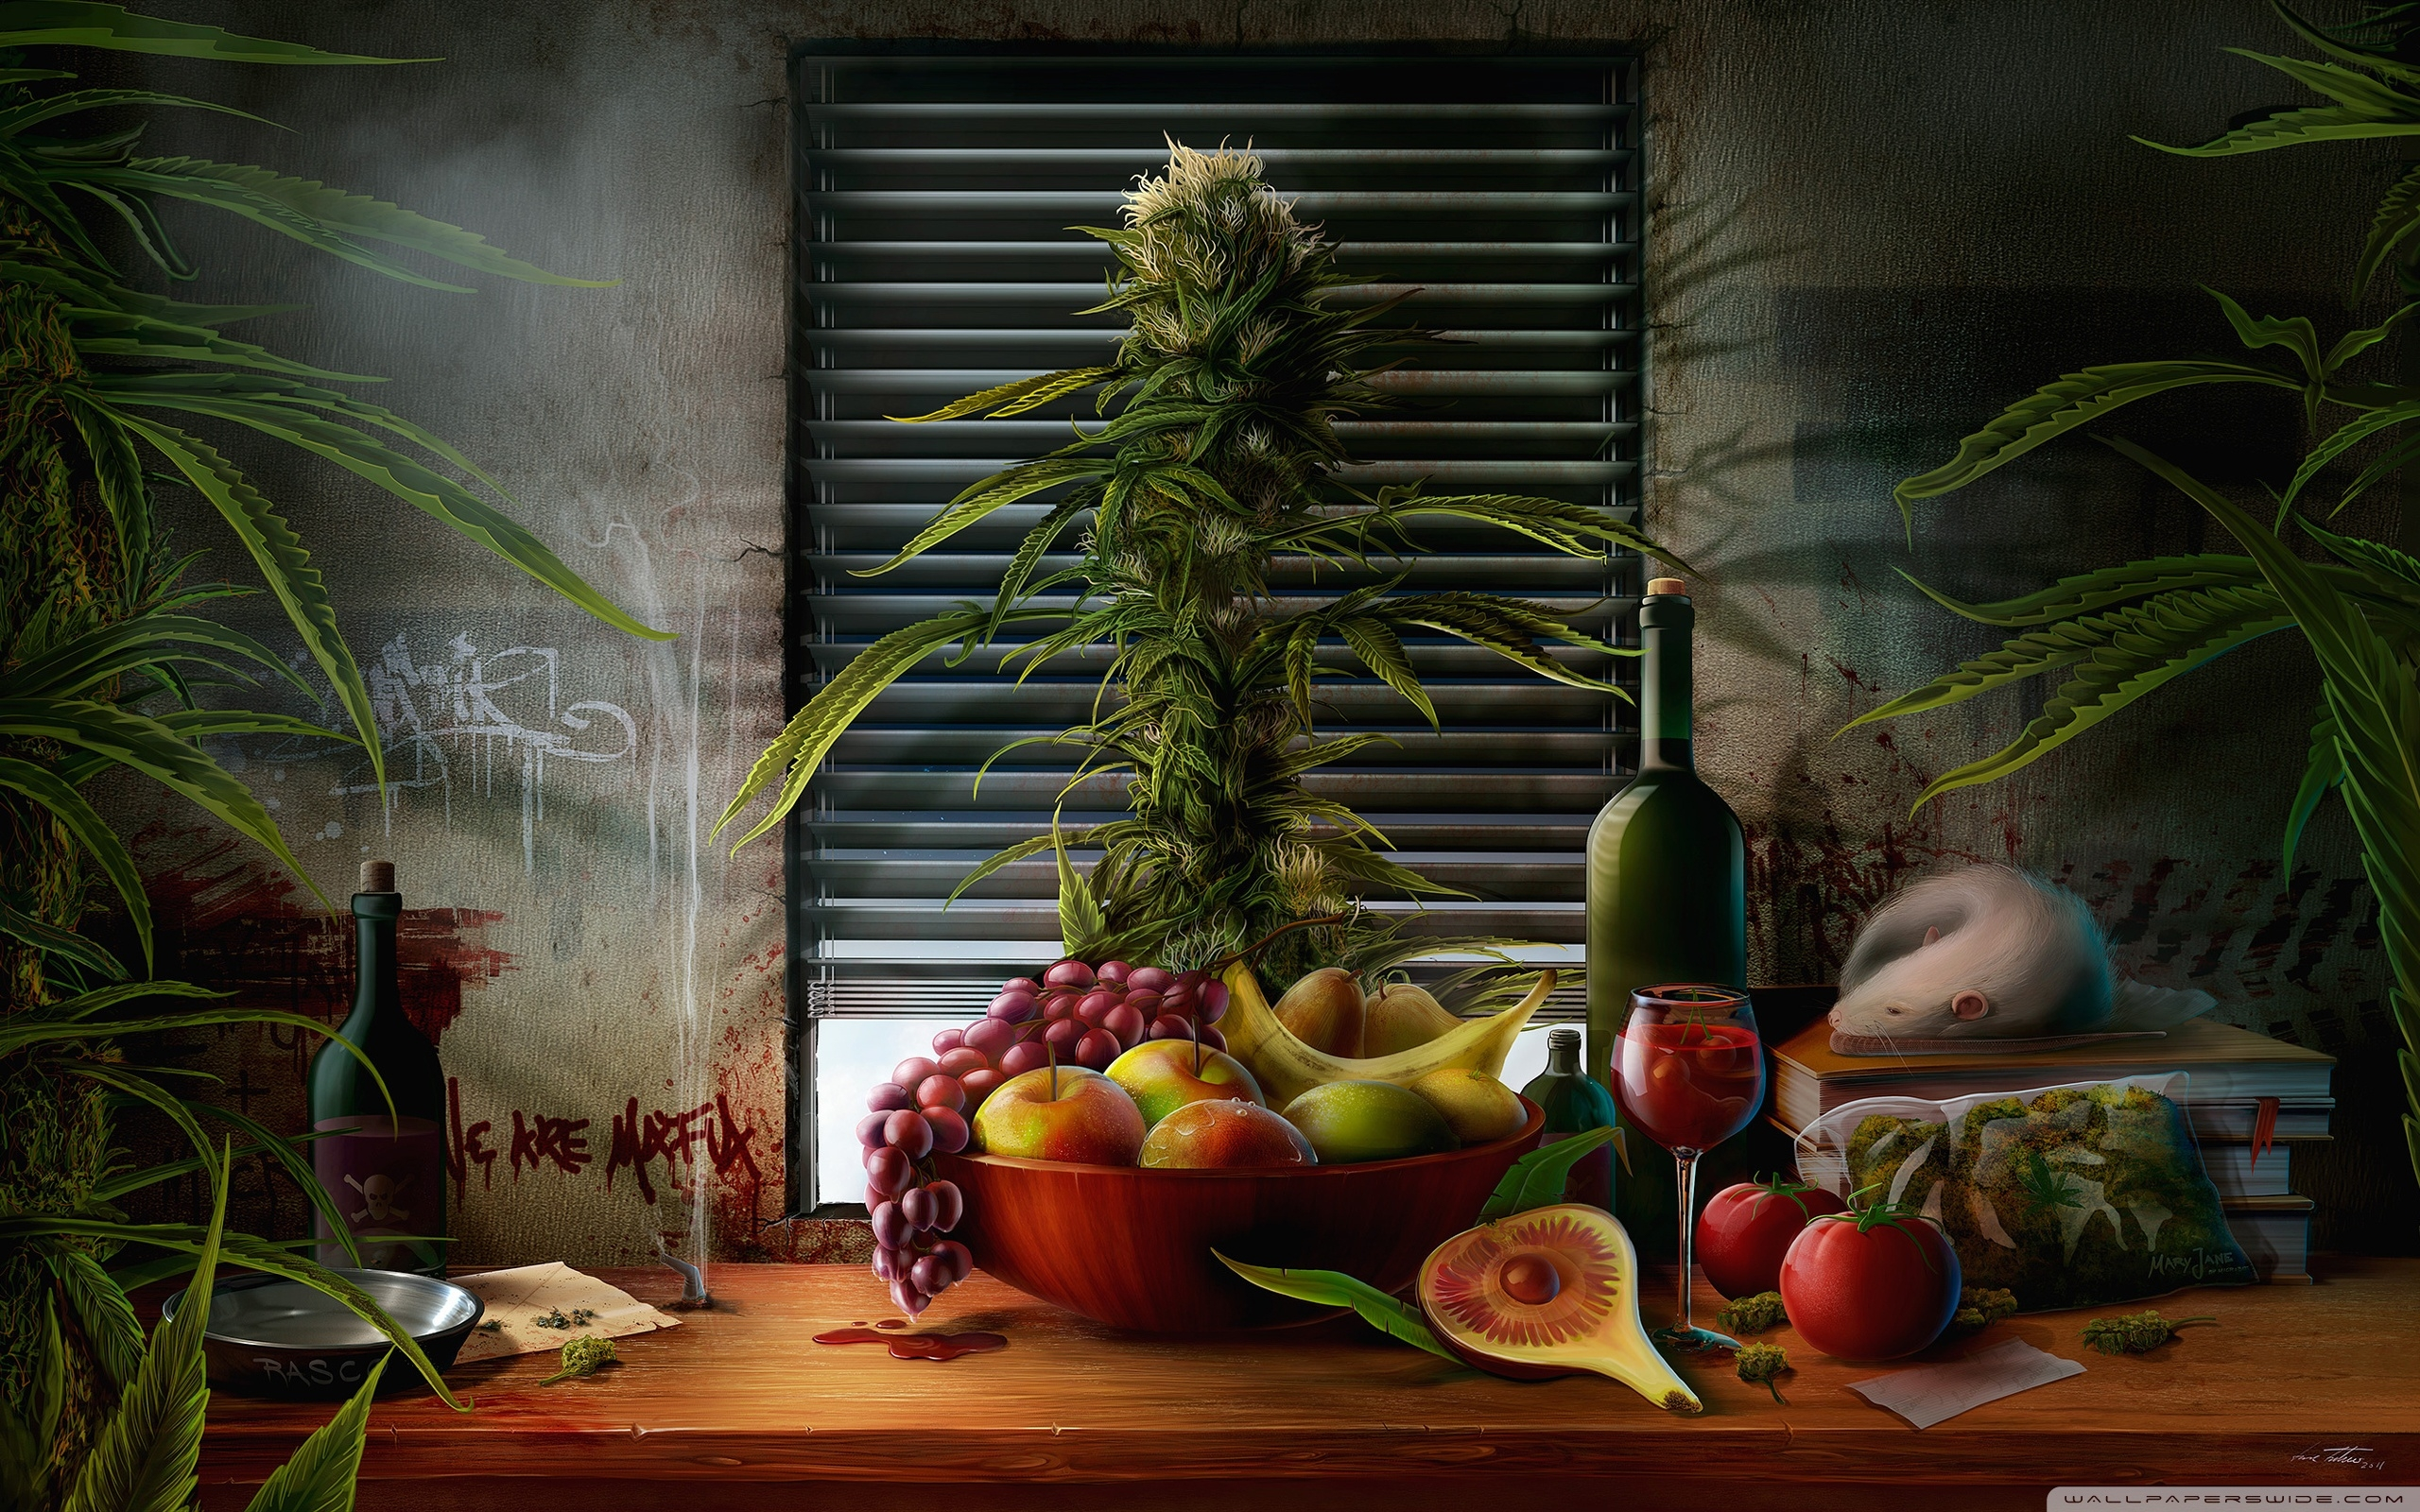 wallpaper, конопля, марихуана, каннабис, канна-тематика, обои на рабочий стол, фотообои, обои, фото, высокое разрешение, full HD, яркая картинка, заставка на рабочий стол, заставка,